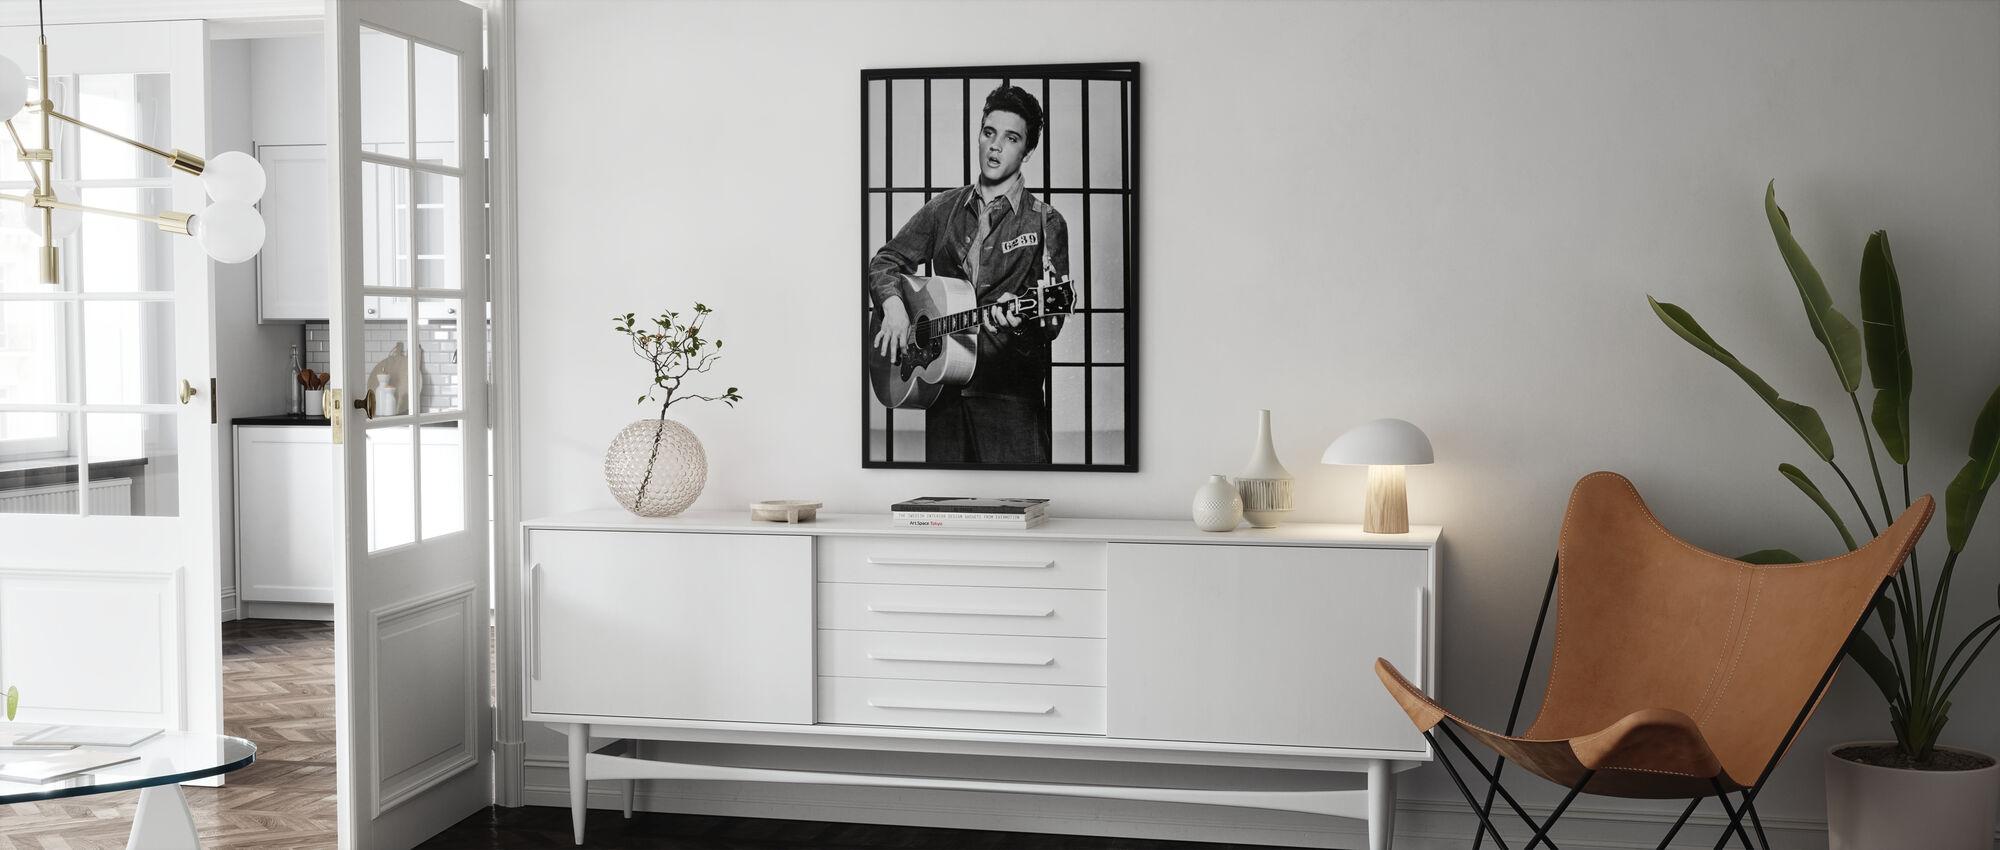 Elvis Presley in Jailhouse Rock - Poster - Living Room